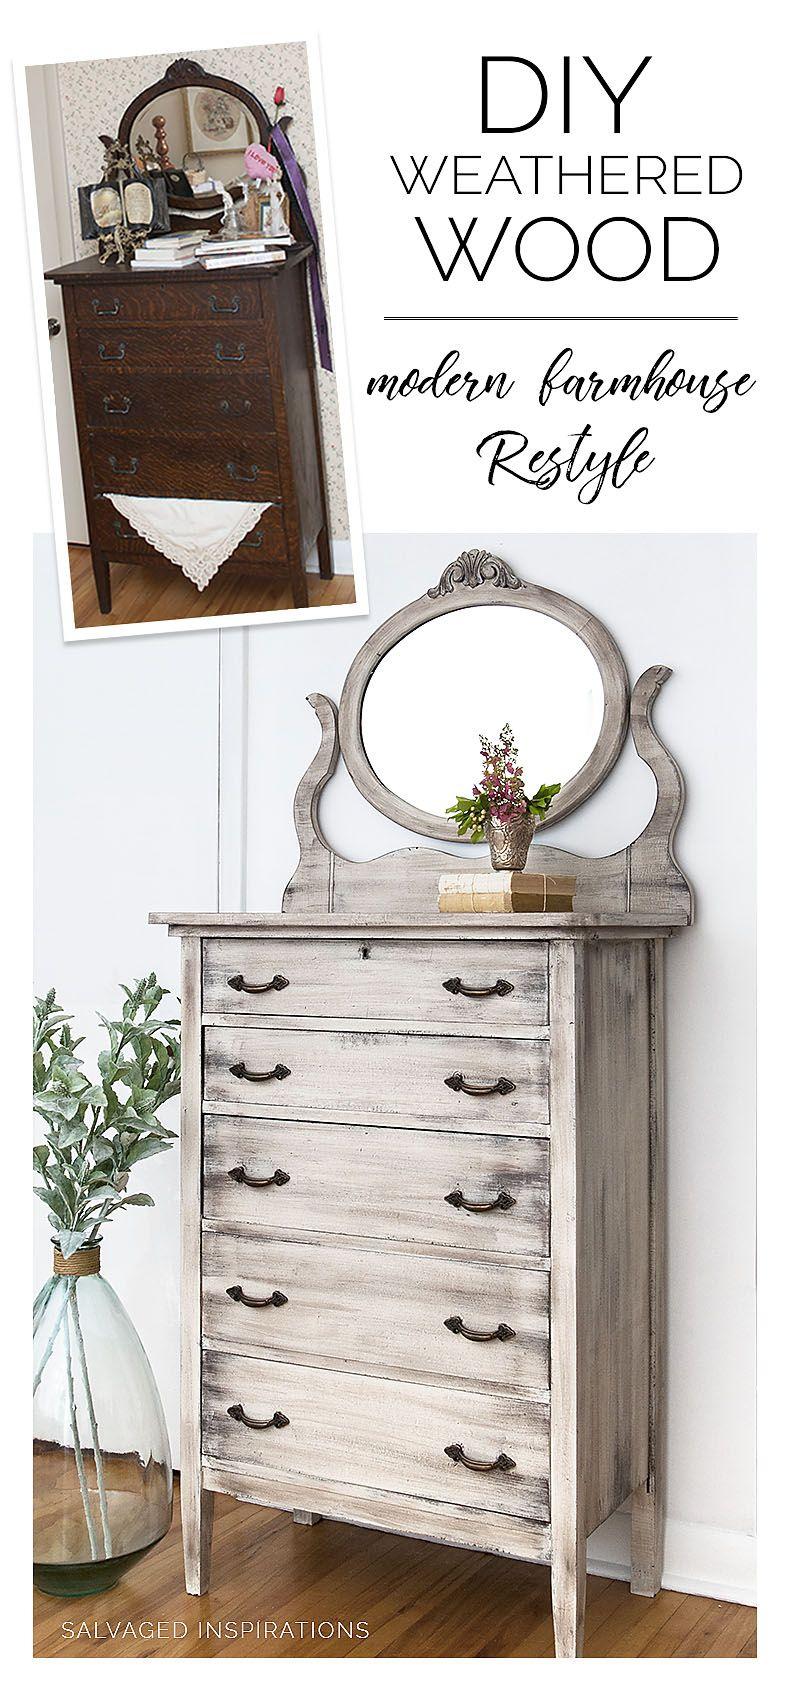 DIY Weathered Wood   Bedroom furniture makeover, Rustic ...